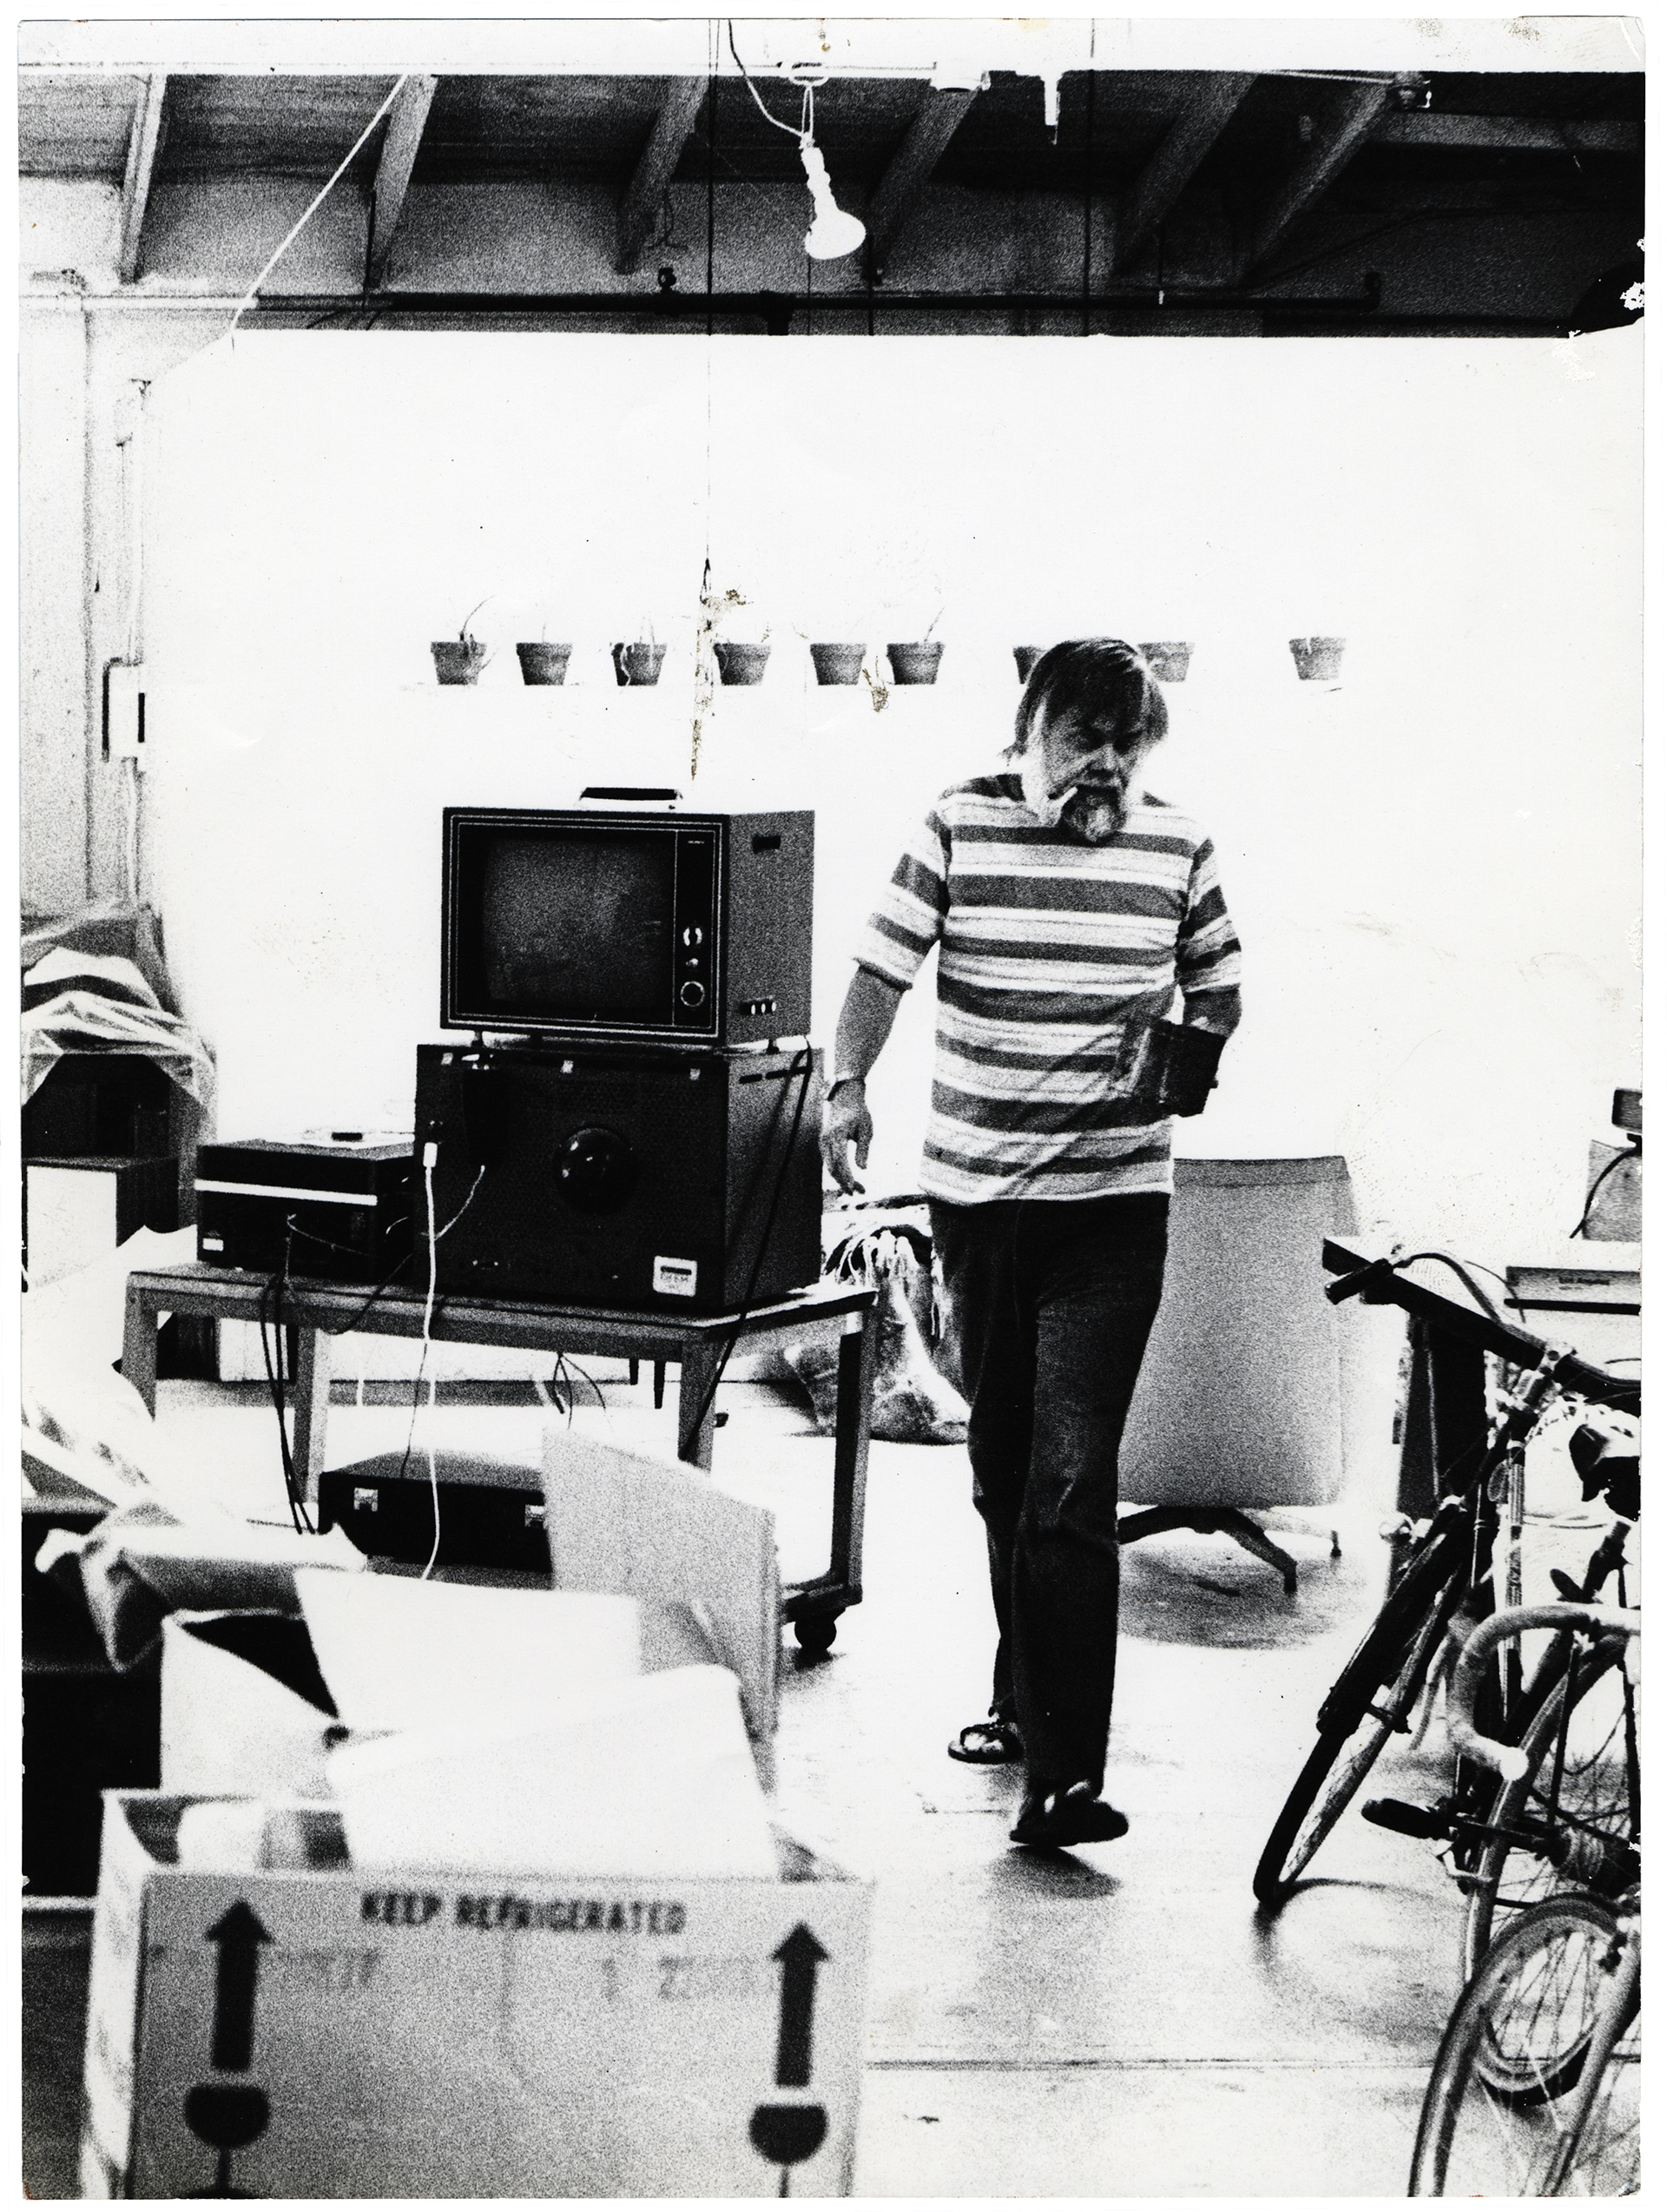 John Baldessari in his studio, 1976.